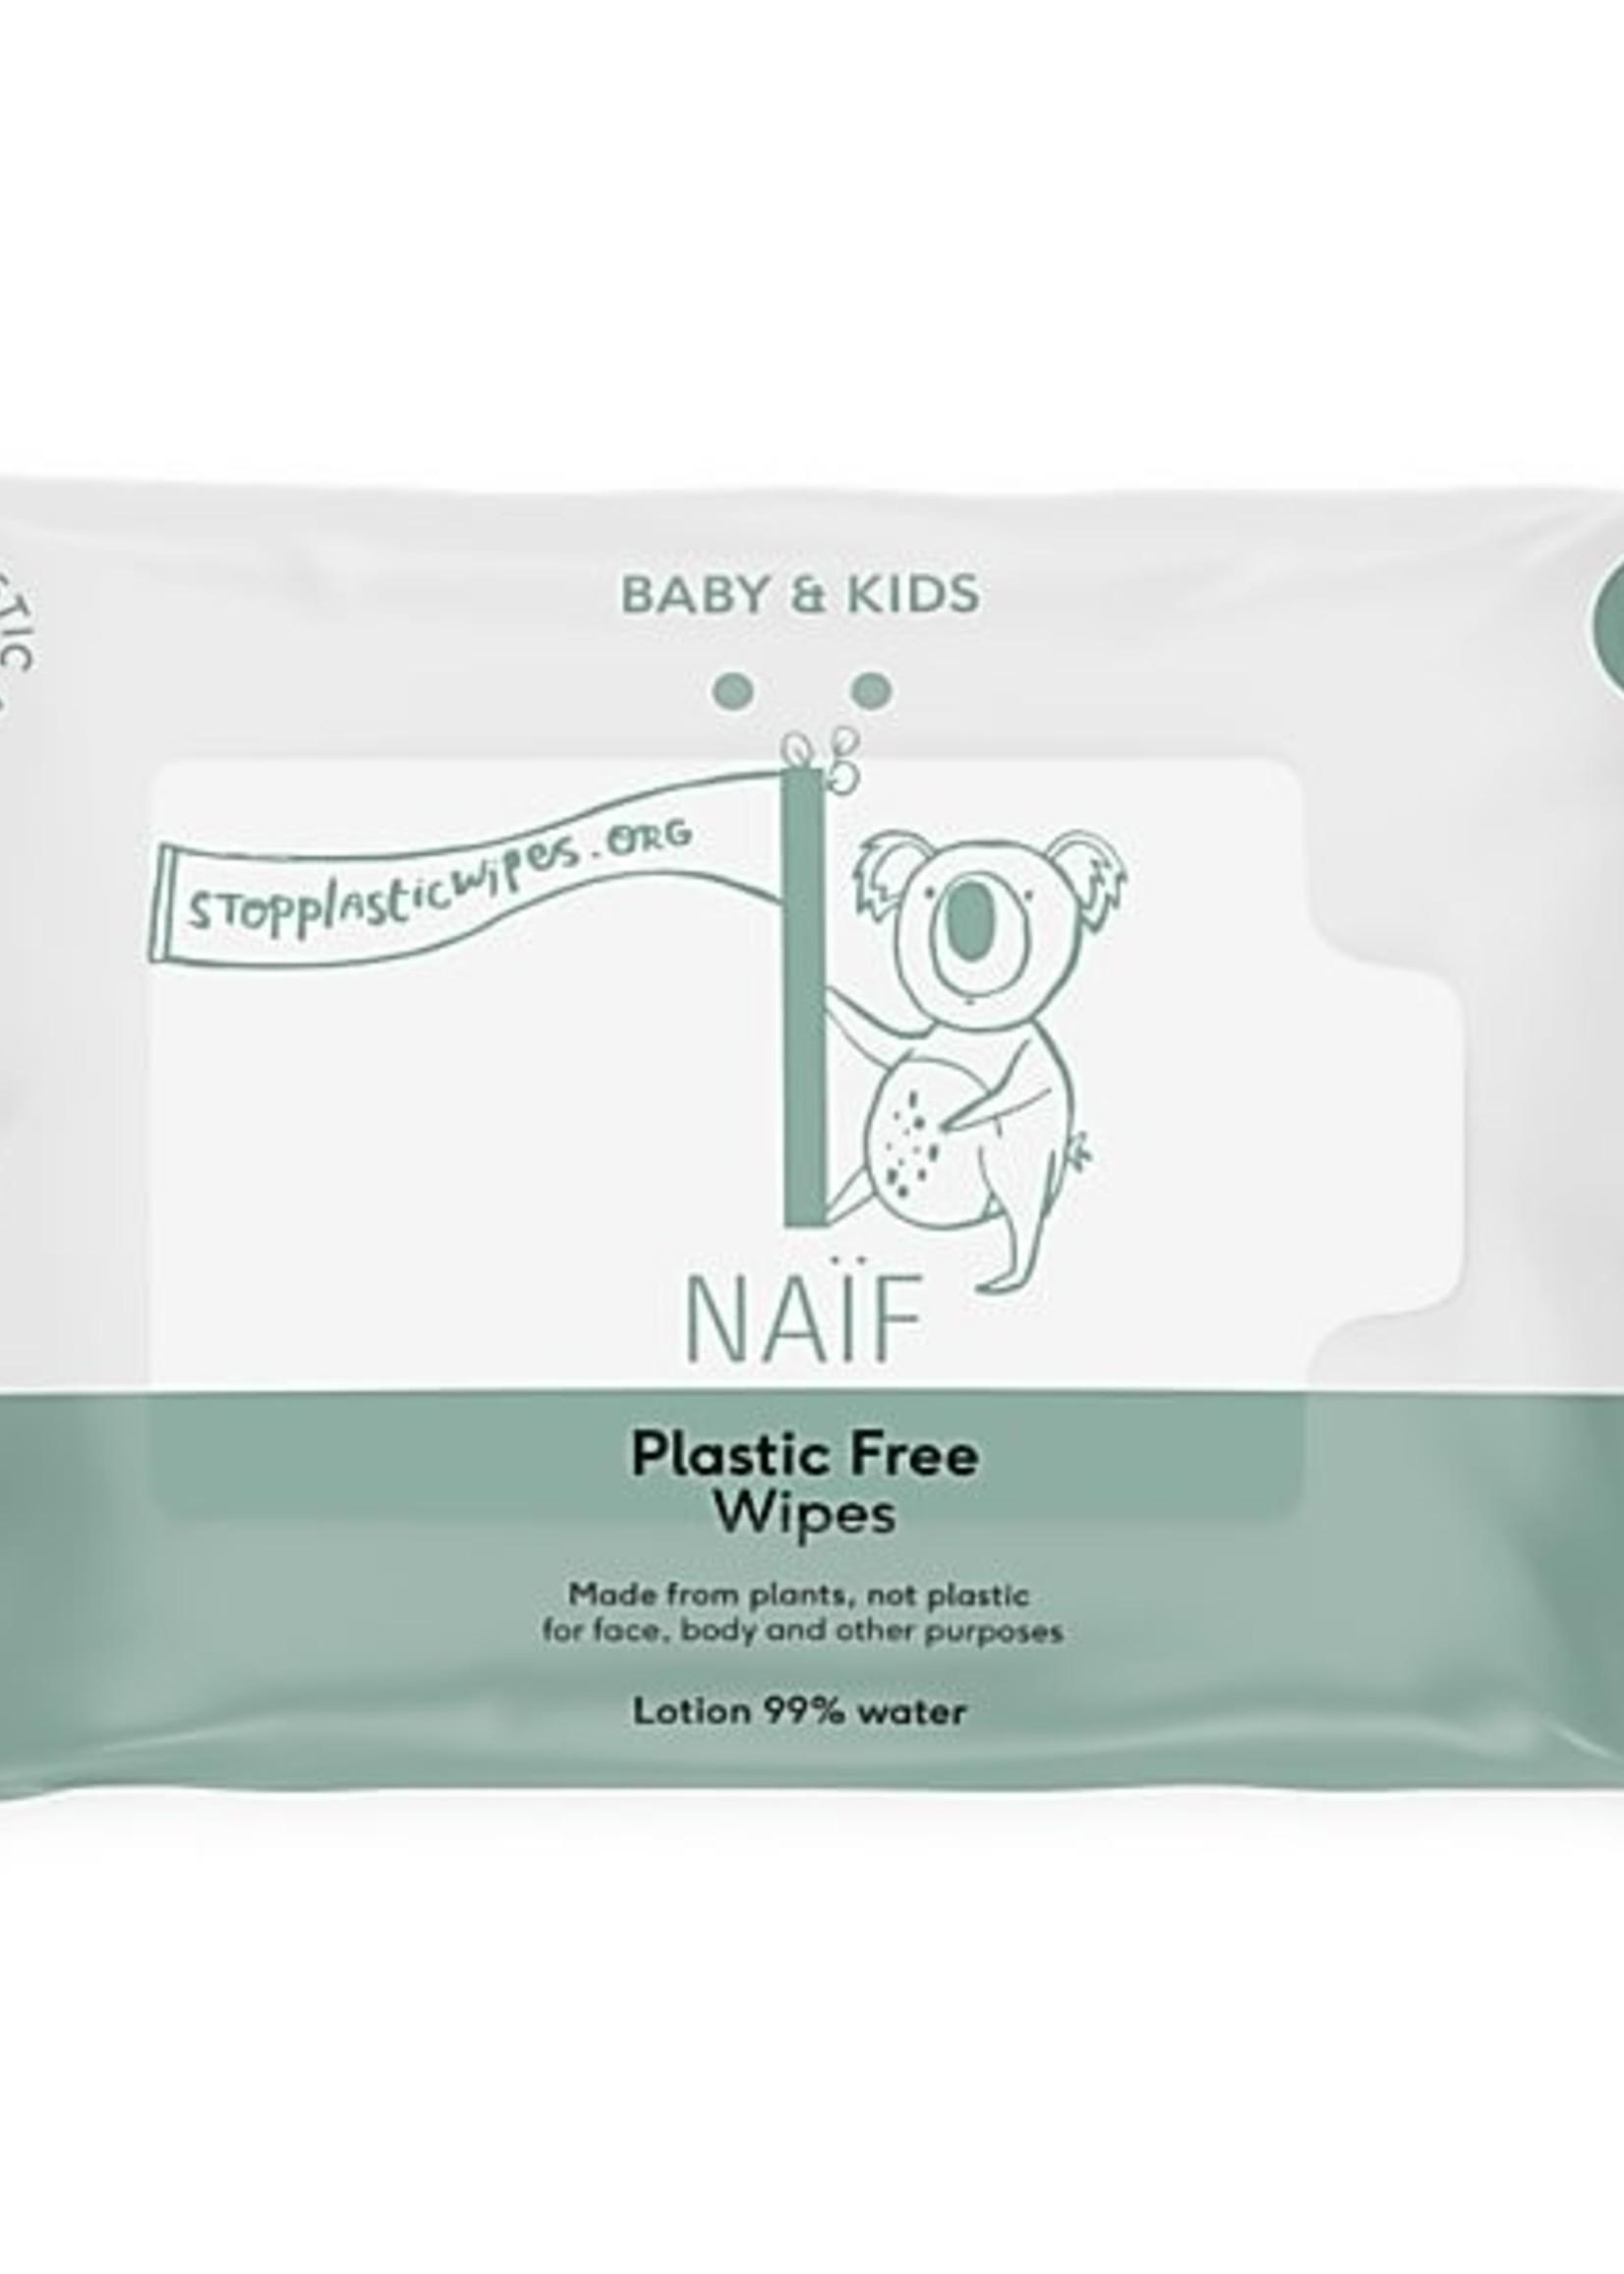 Naïf Baby & Kids Wipes - Plastic Free